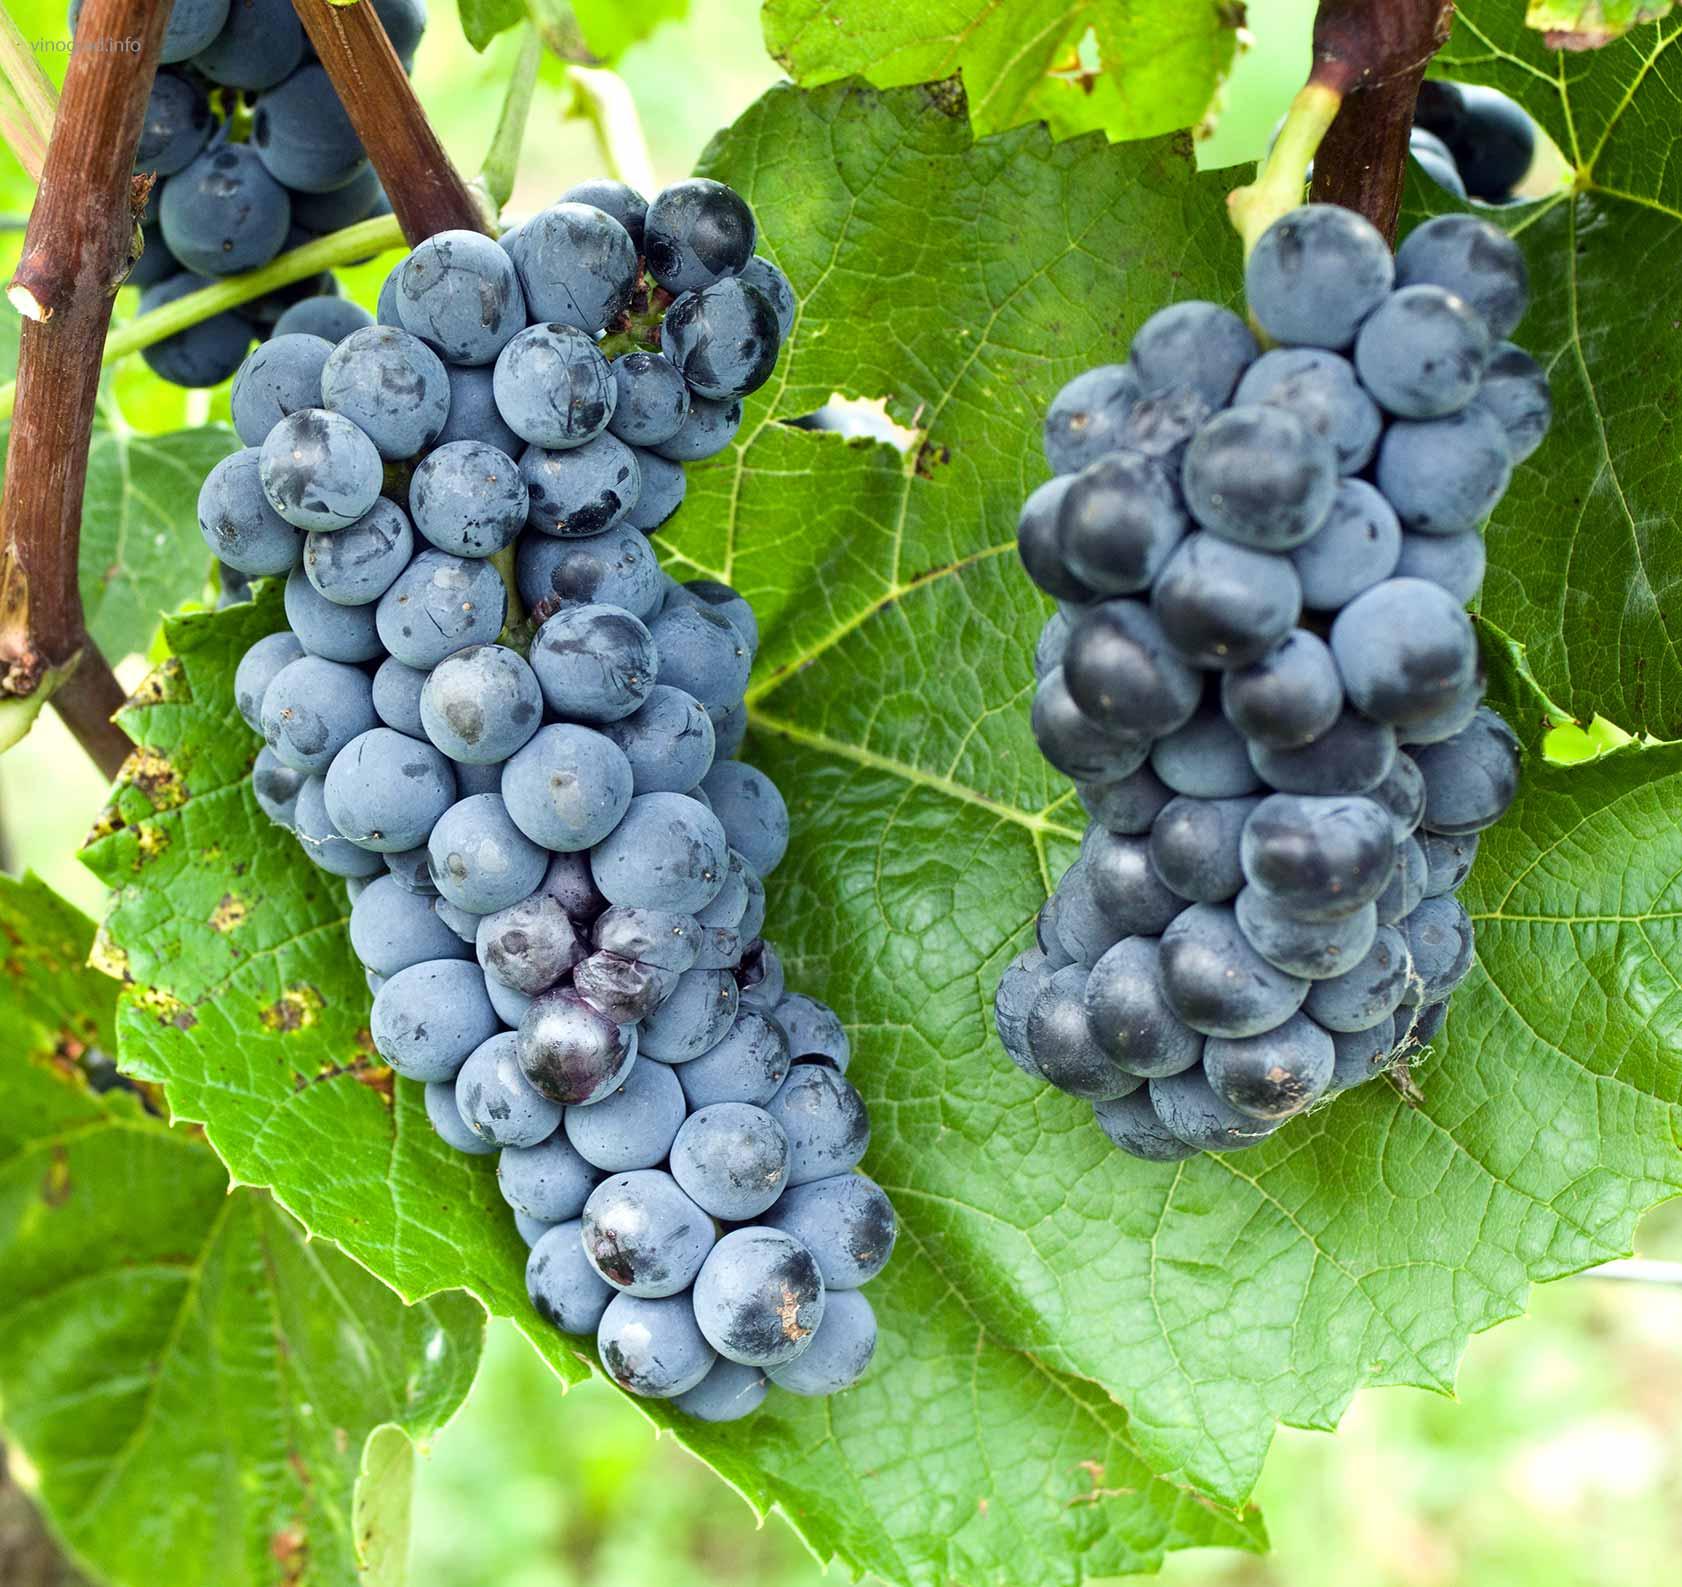 Характеристика винограда сорта вэлиант - агро журнал dachnye-fei.ru